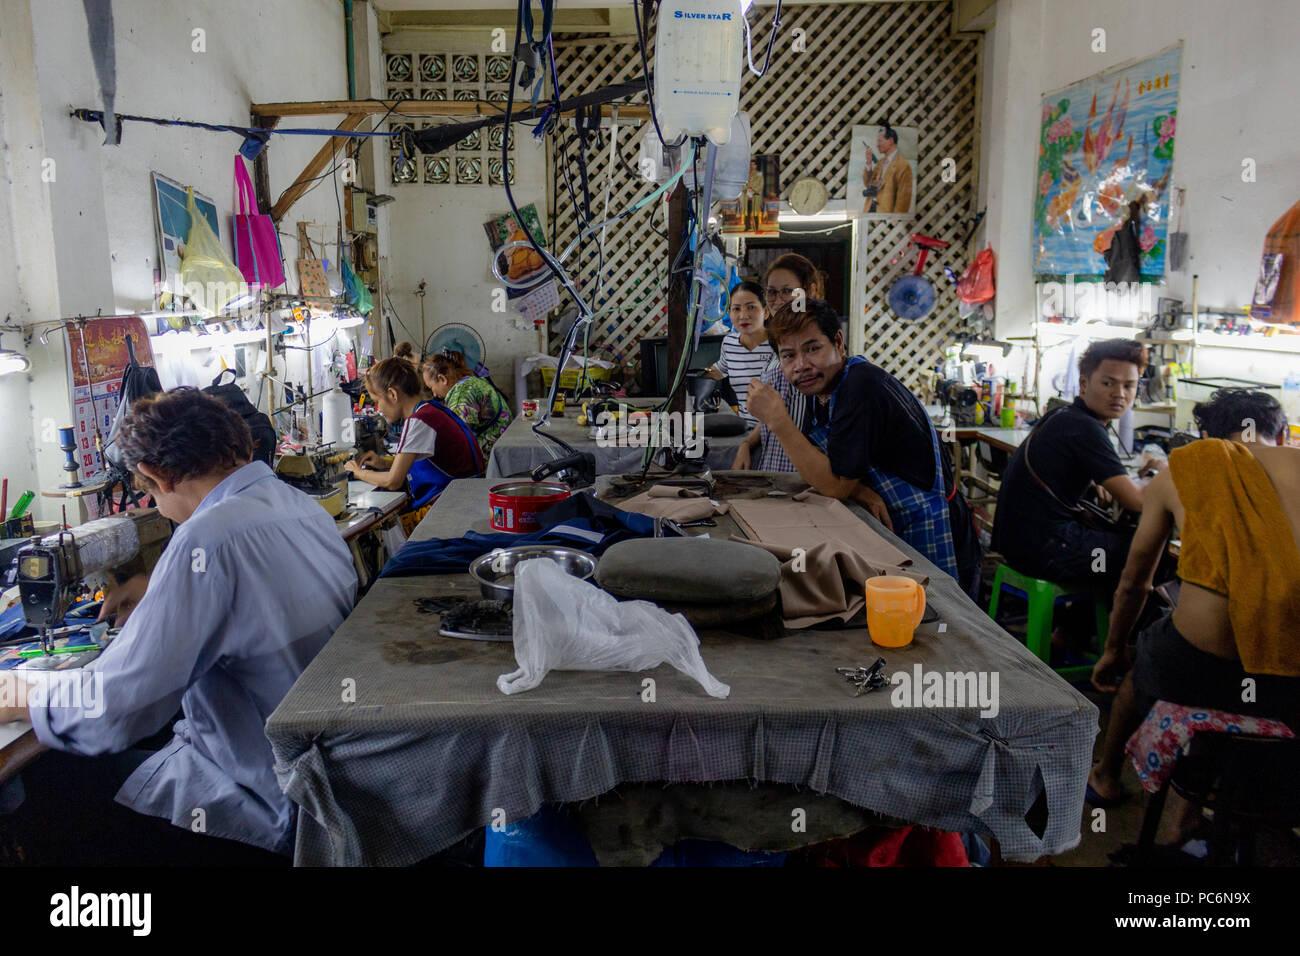 Bangkok, Thailand - May 1, 2018: People sewing in a local tailor workshop in Bangkok Stock Photo